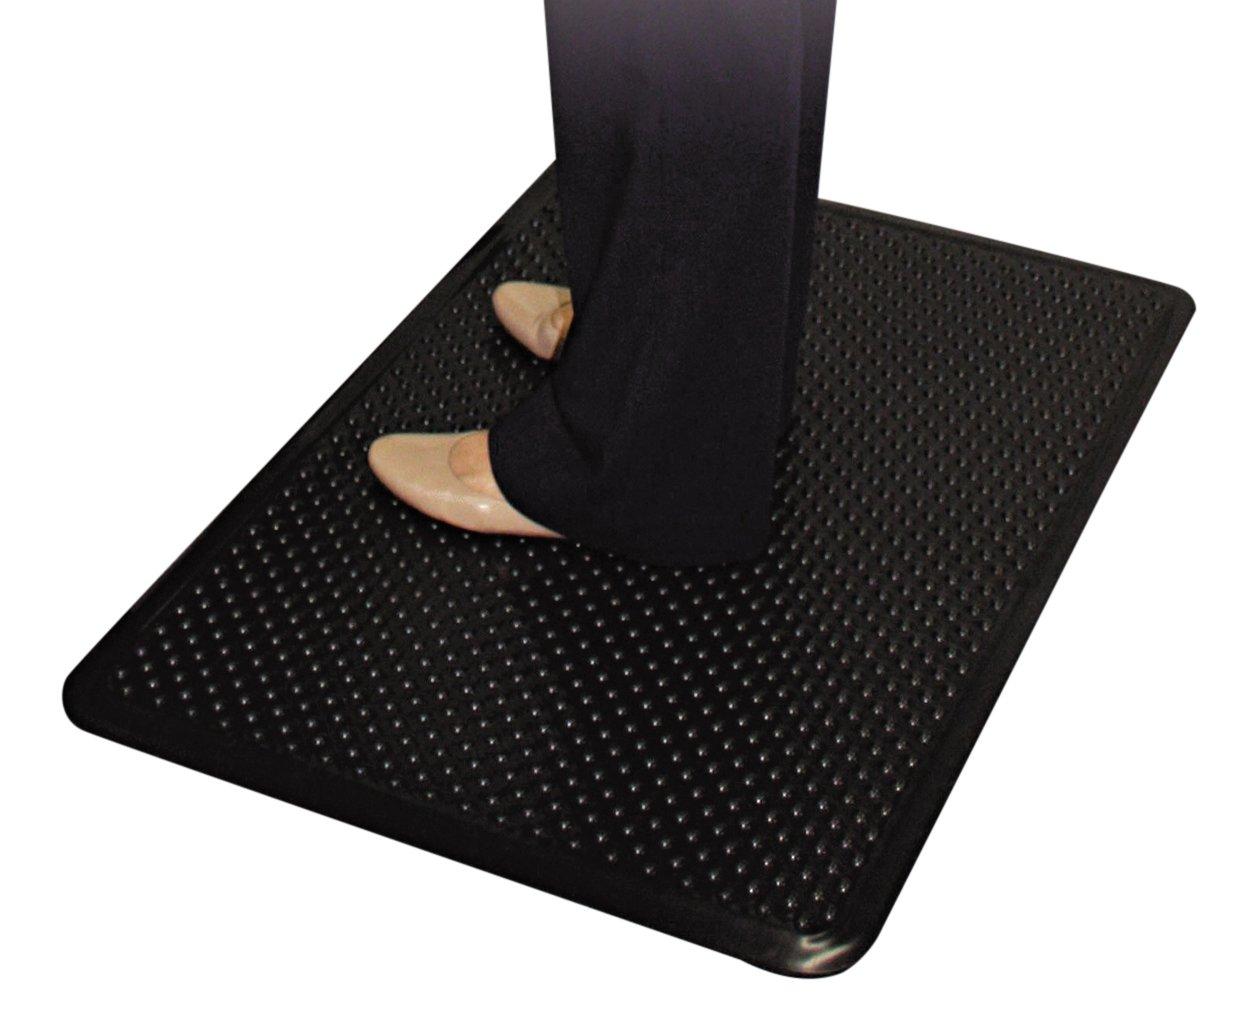 ES Robbins Feel Good Anti-Fatigue Vinyl Mat, 2-Feet by 3-Feet 3/8-Inch, Black 184552